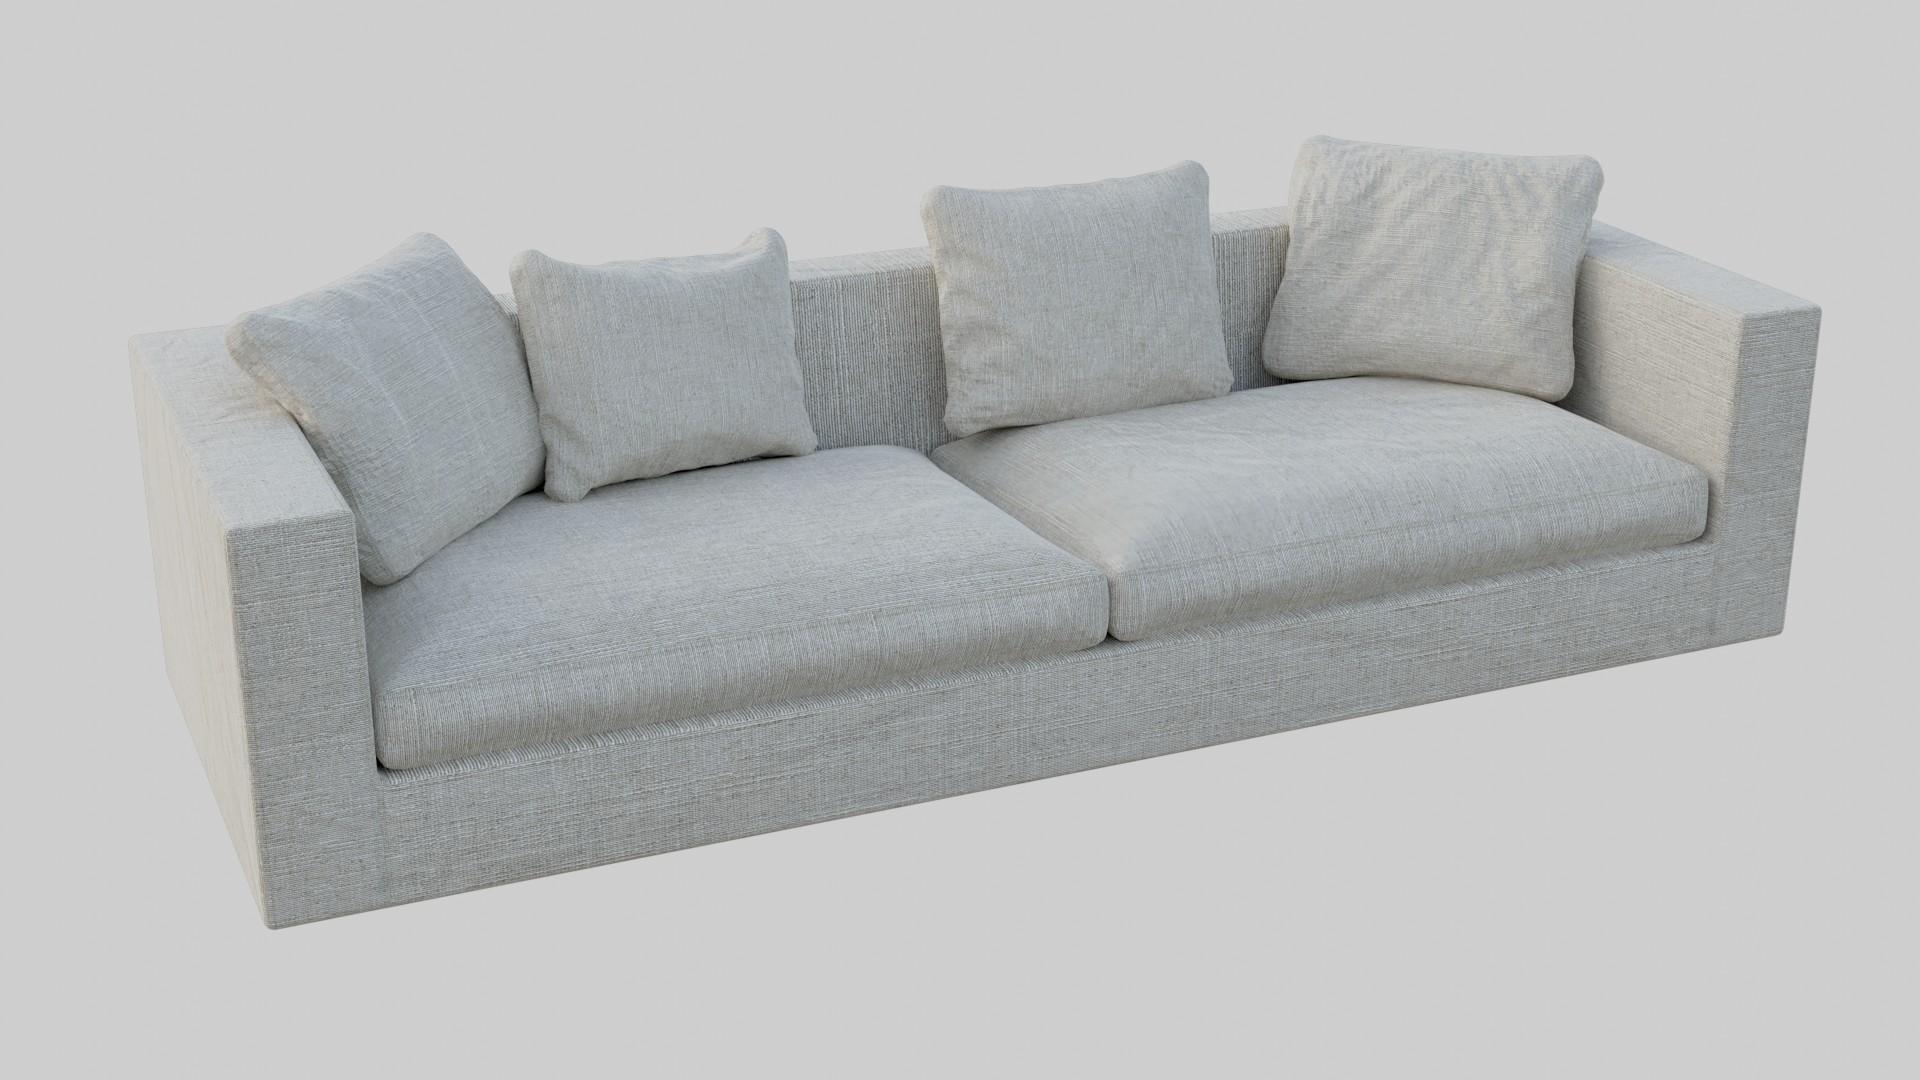 Low-Poly 3D Model of a Cozy Sofa